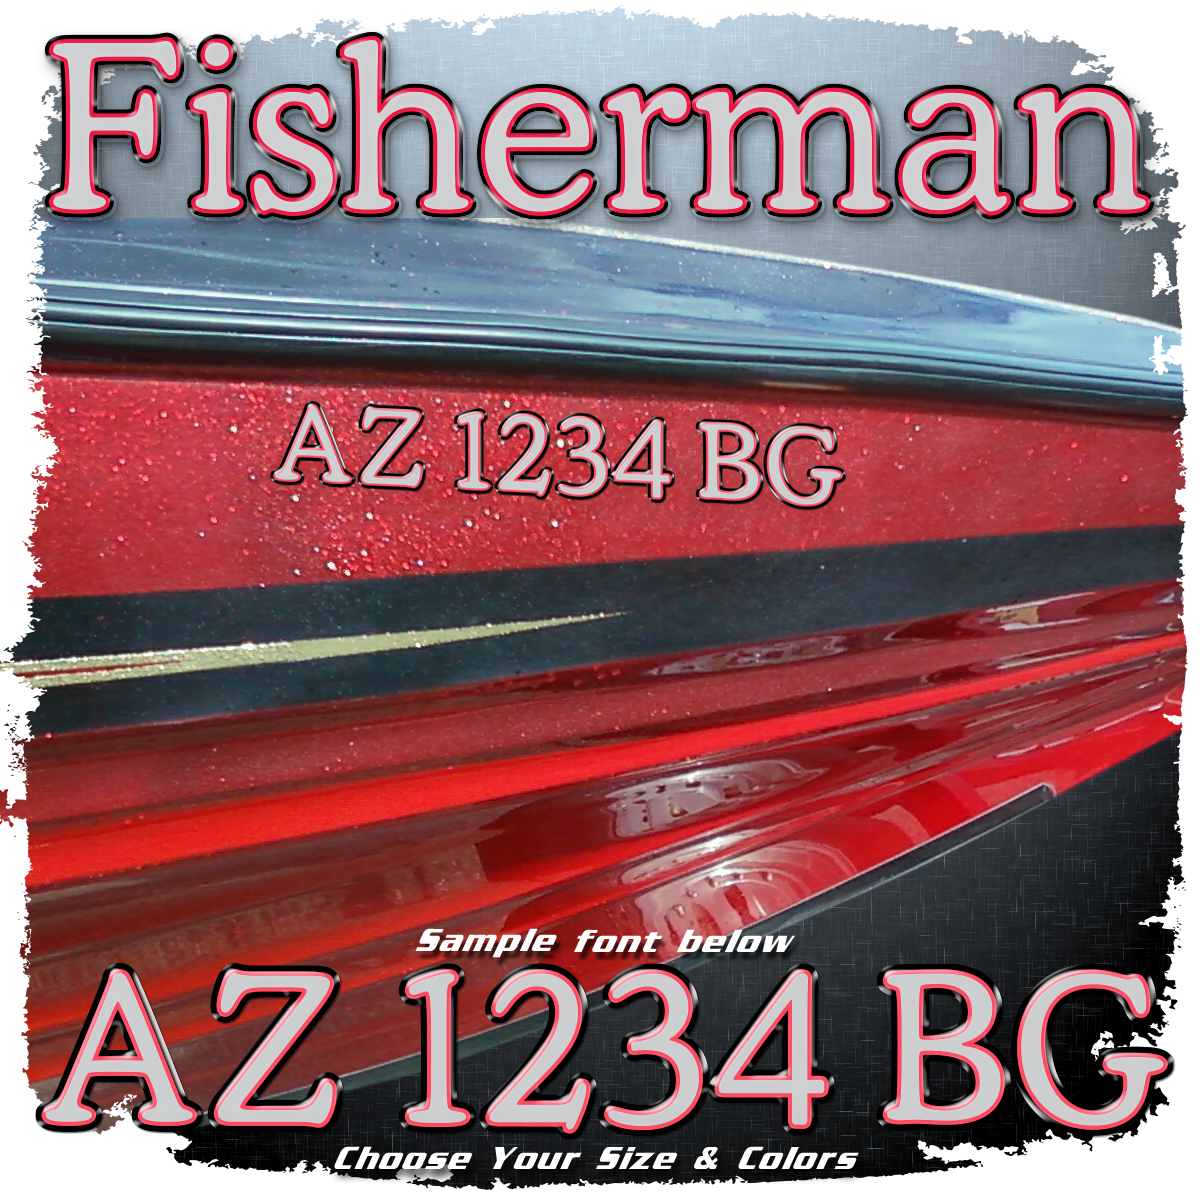 Ranger Fisherman Font Registration, Choose Your Colors (2 included)